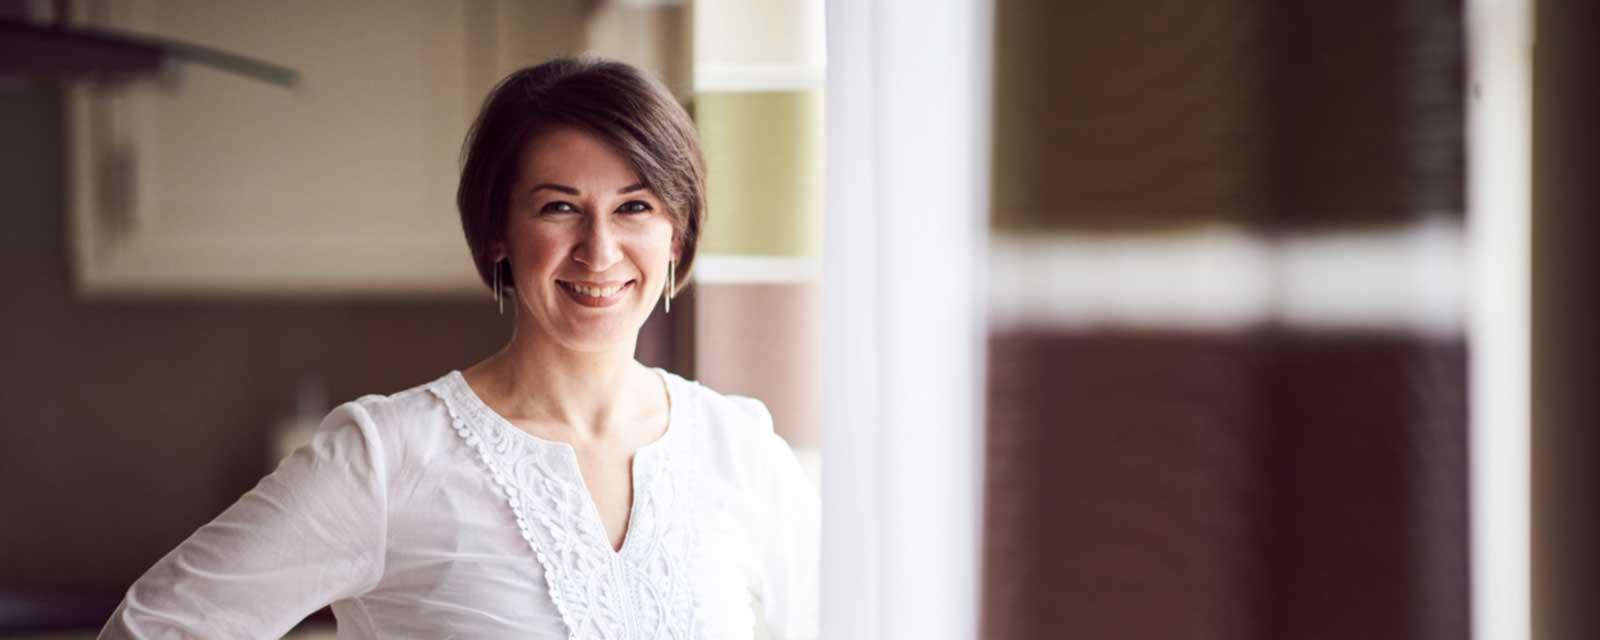 Klaudia Schuh, Holistic Health and Sleep Coach